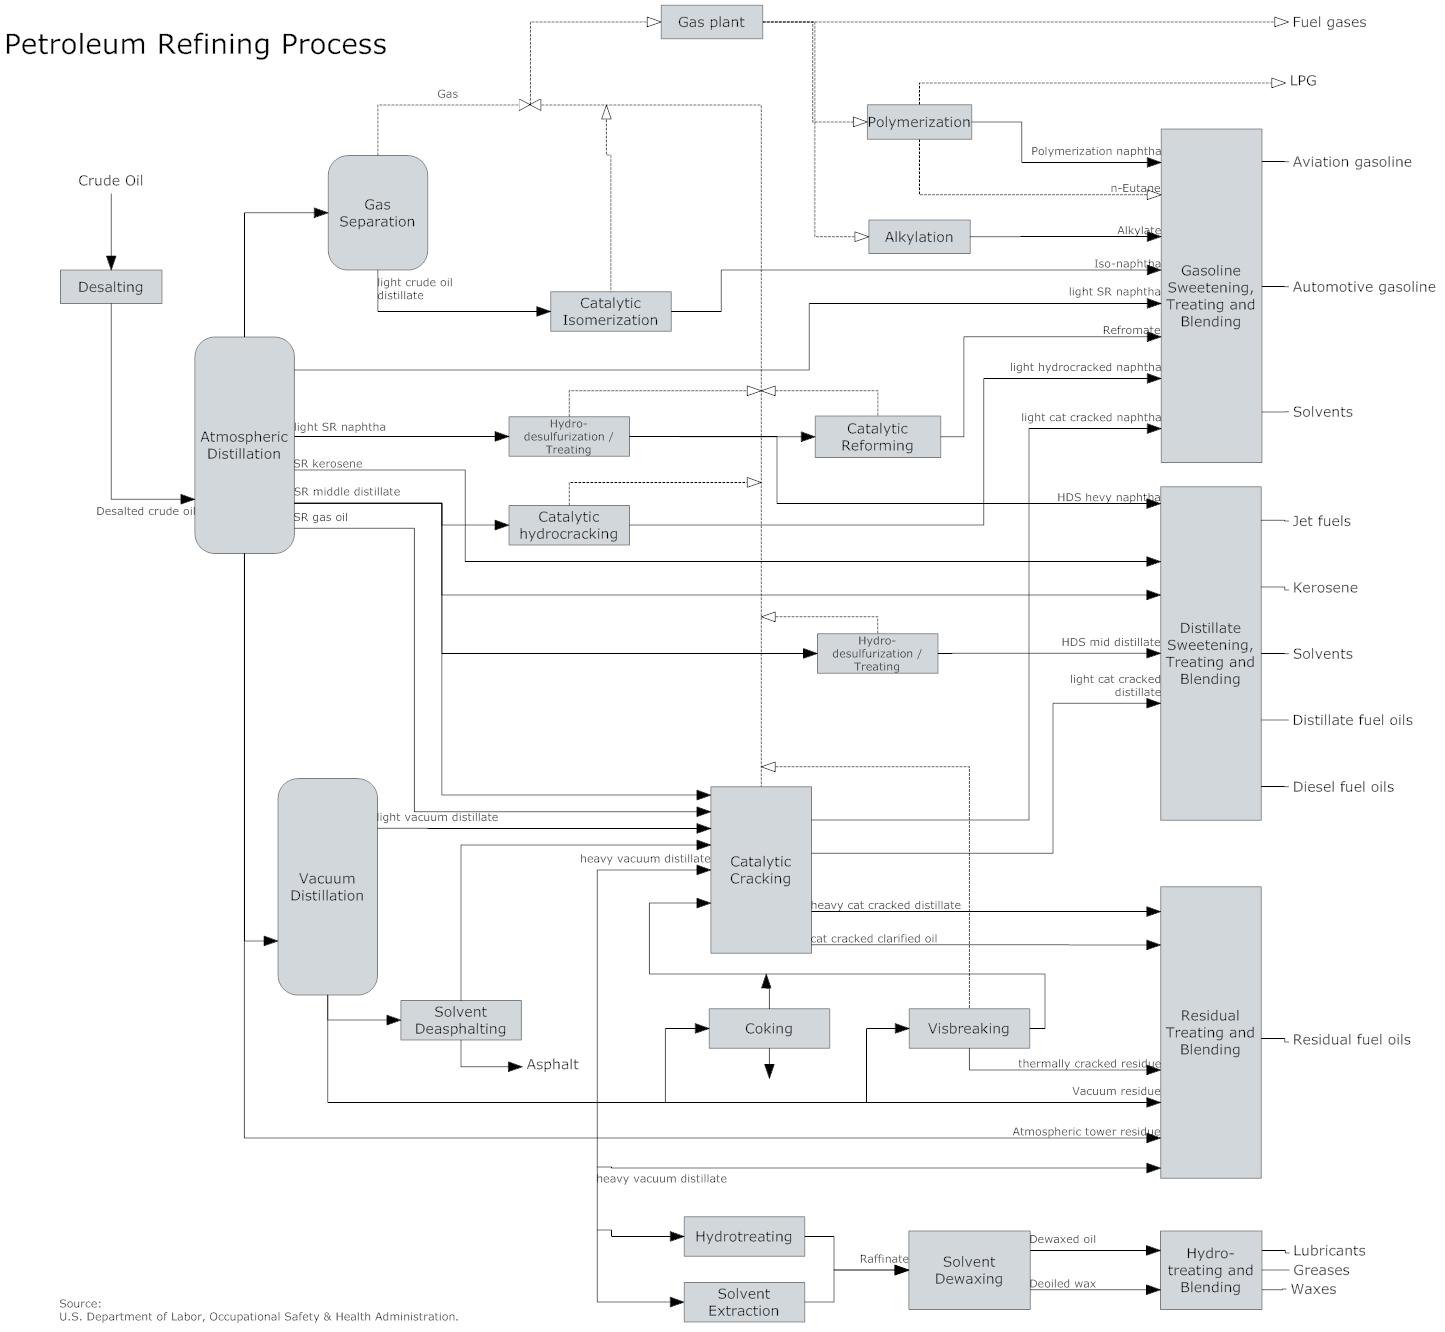 process flow diagram software free process flow diagram pfd templates logo design process flow chart process flow diagram design images #15